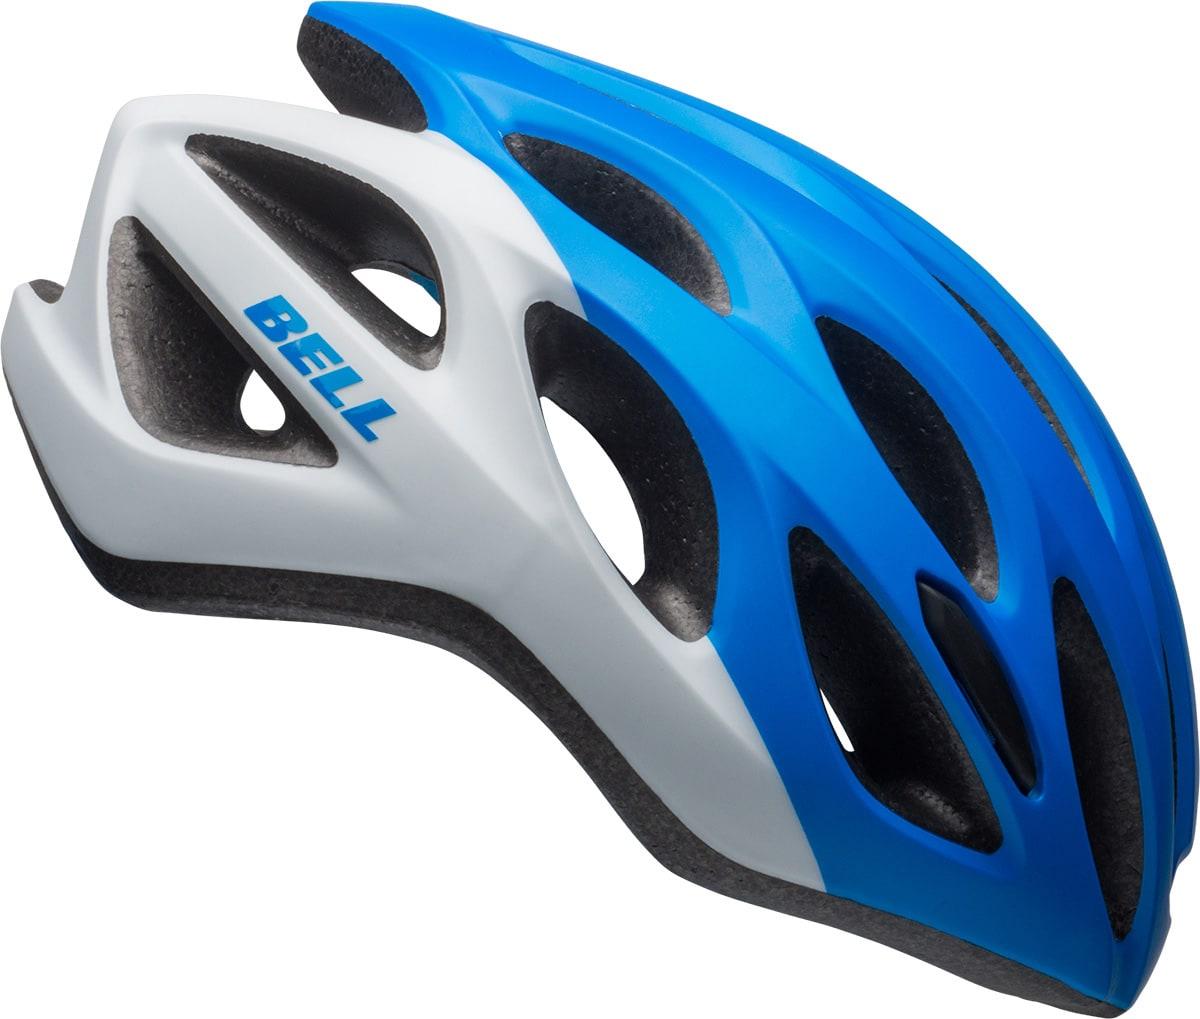 bell draft mips bike helmet. Black Bedroom Furniture Sets. Home Design Ideas